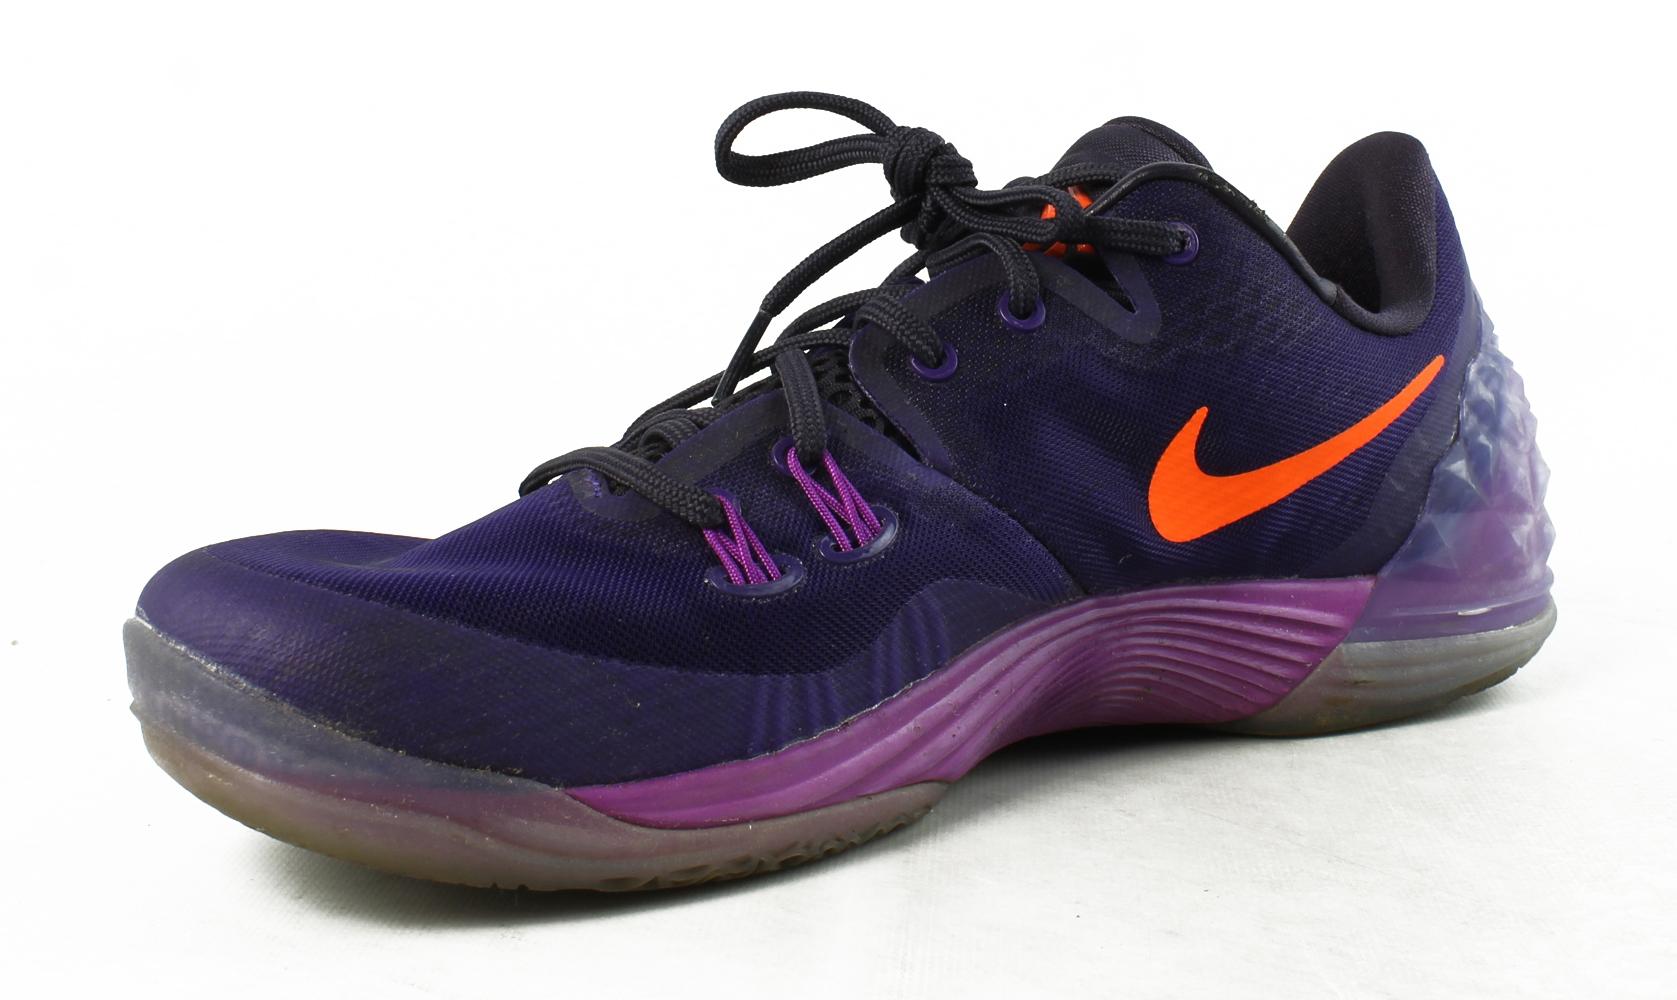 Nike - mens - 10,5 lila laufschuhe größe 10,5 - (351805) 47c2ad